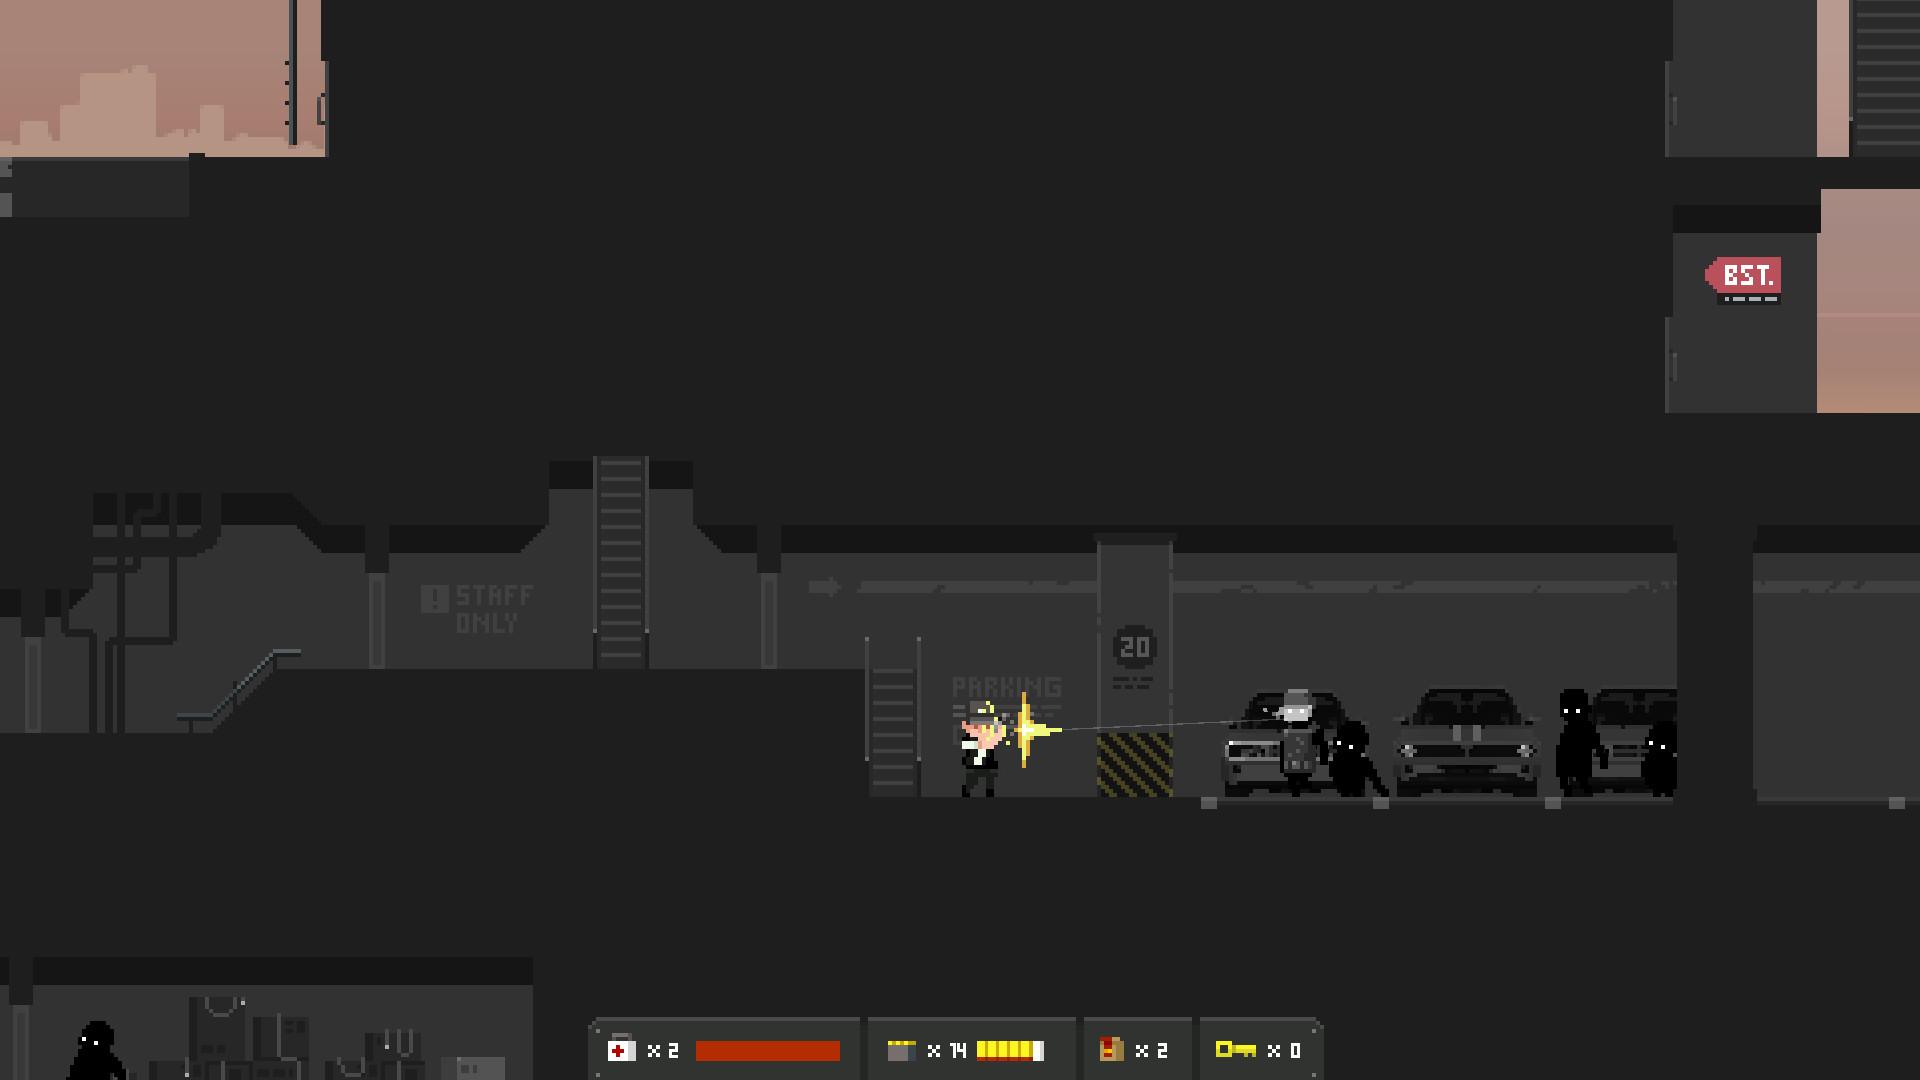 The Final Station Screenshot 3